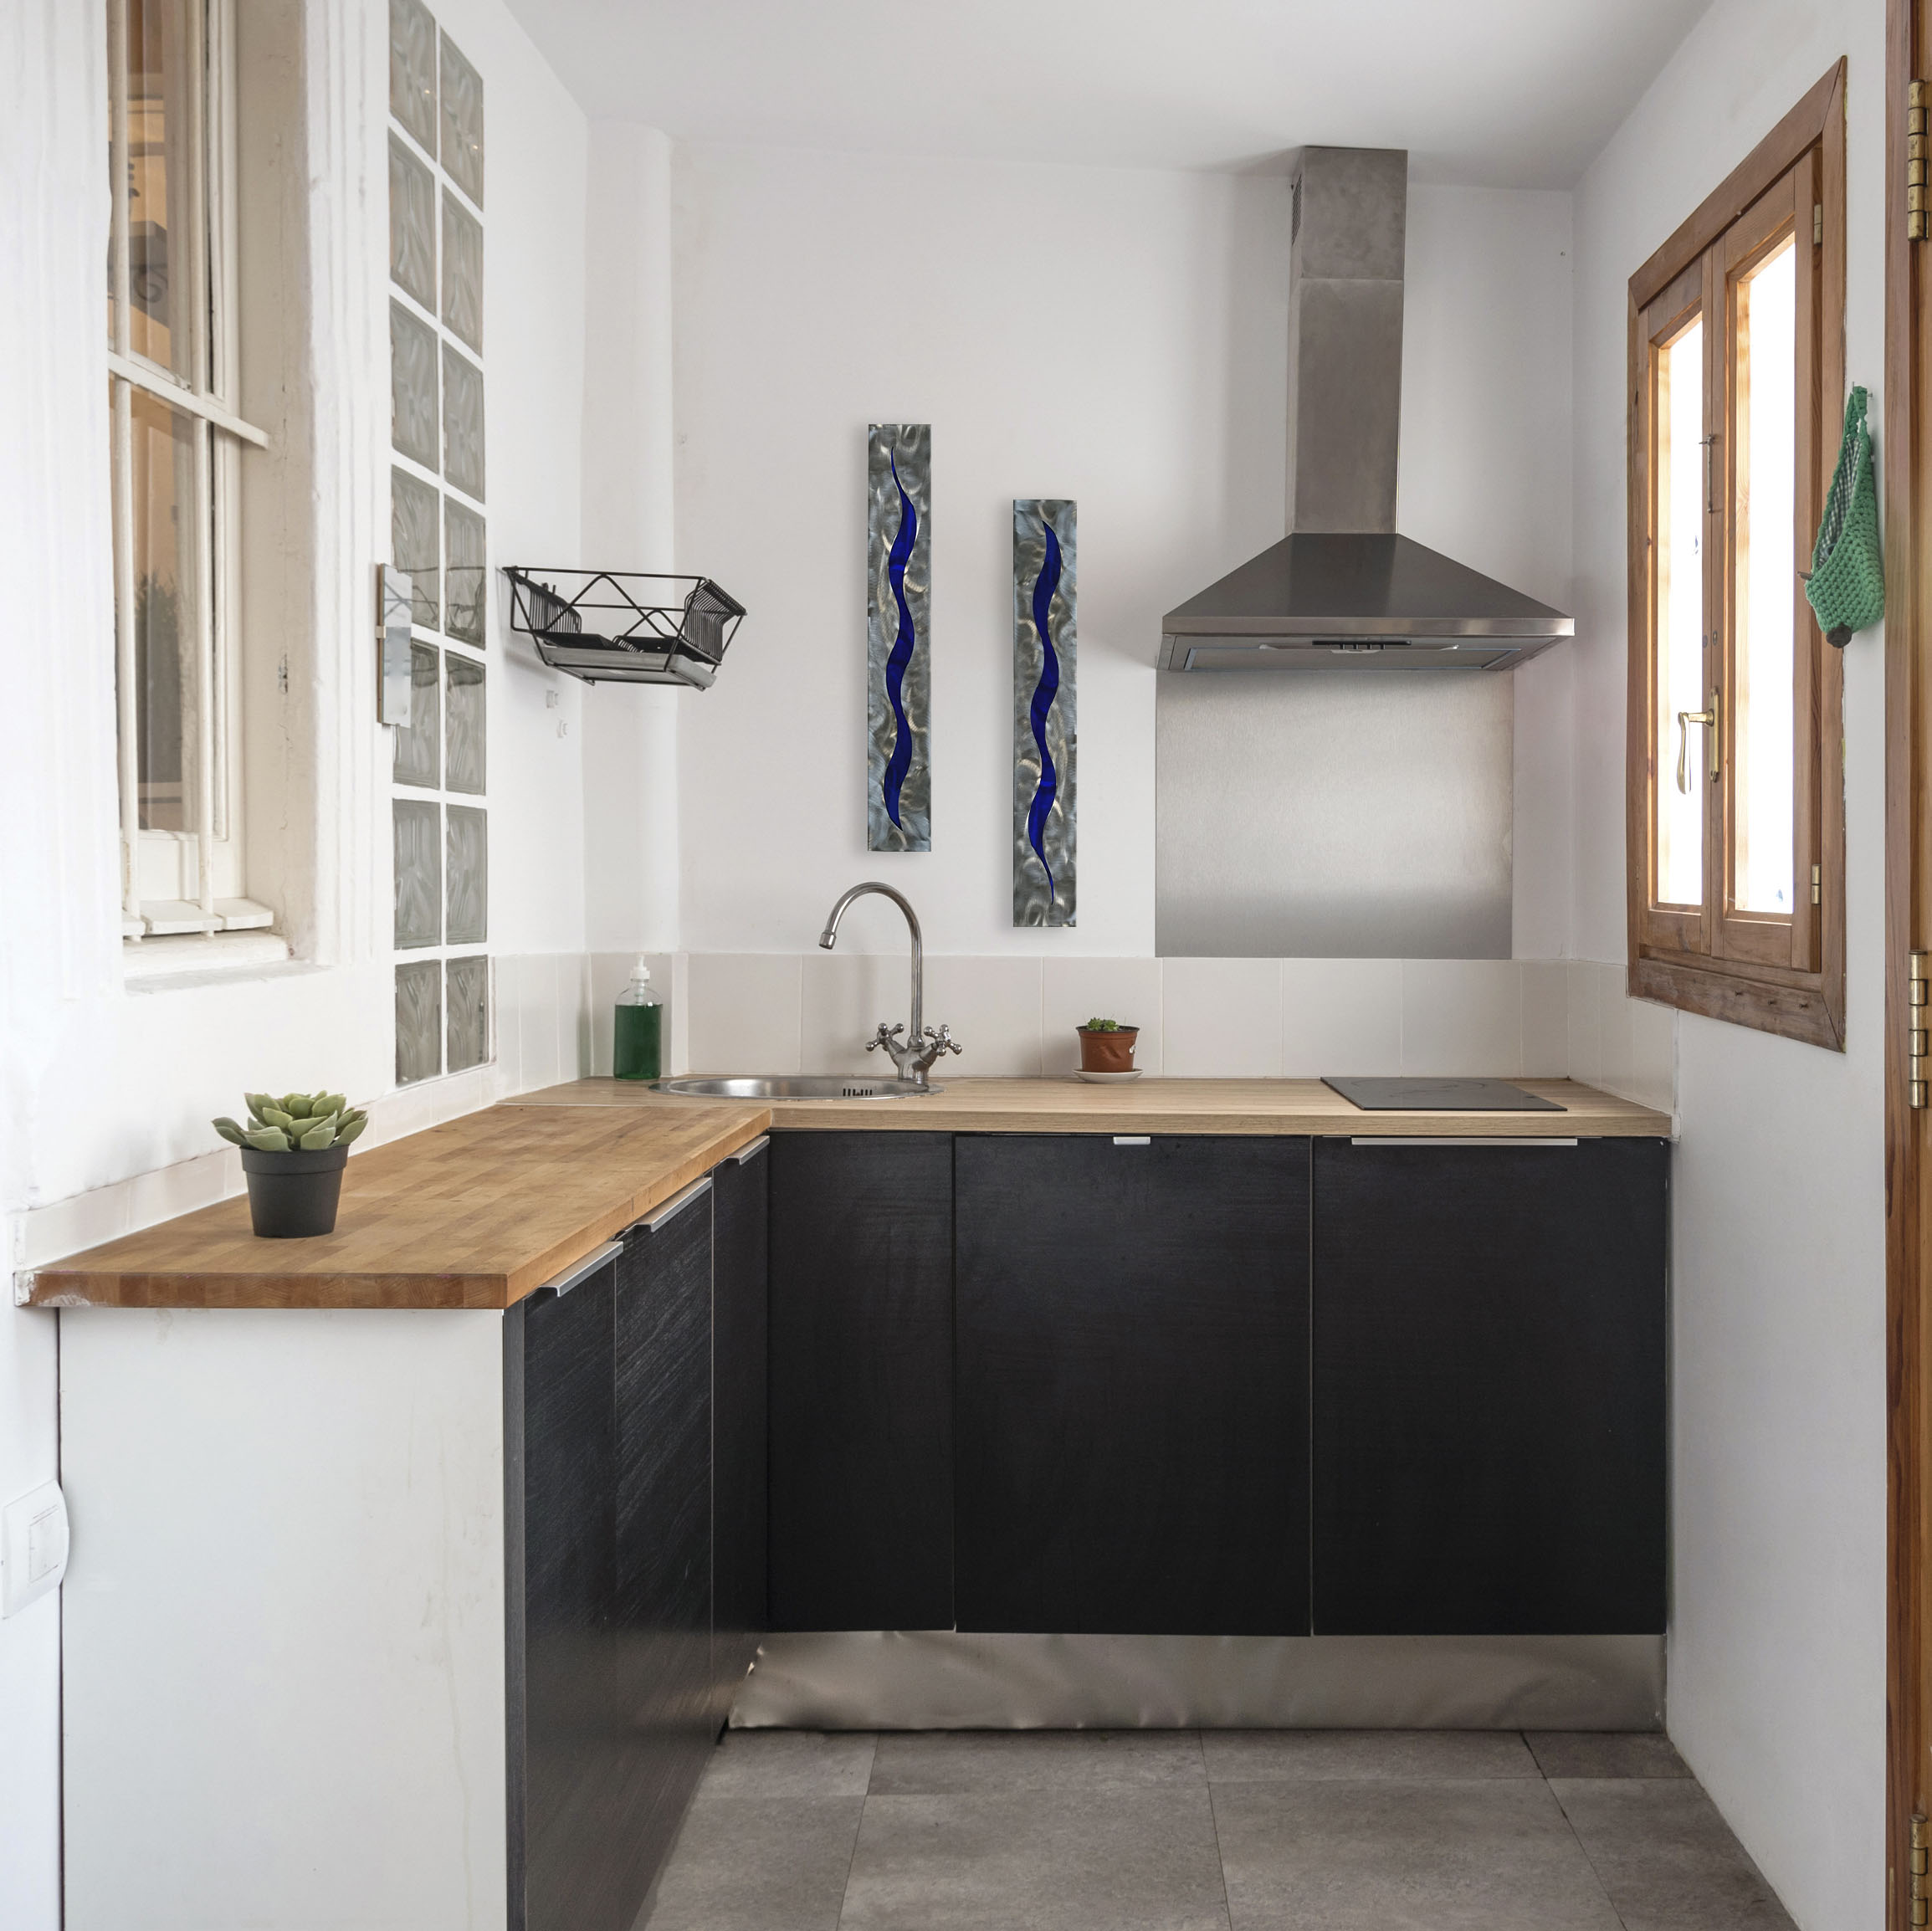 blue-scars-in-kitchen